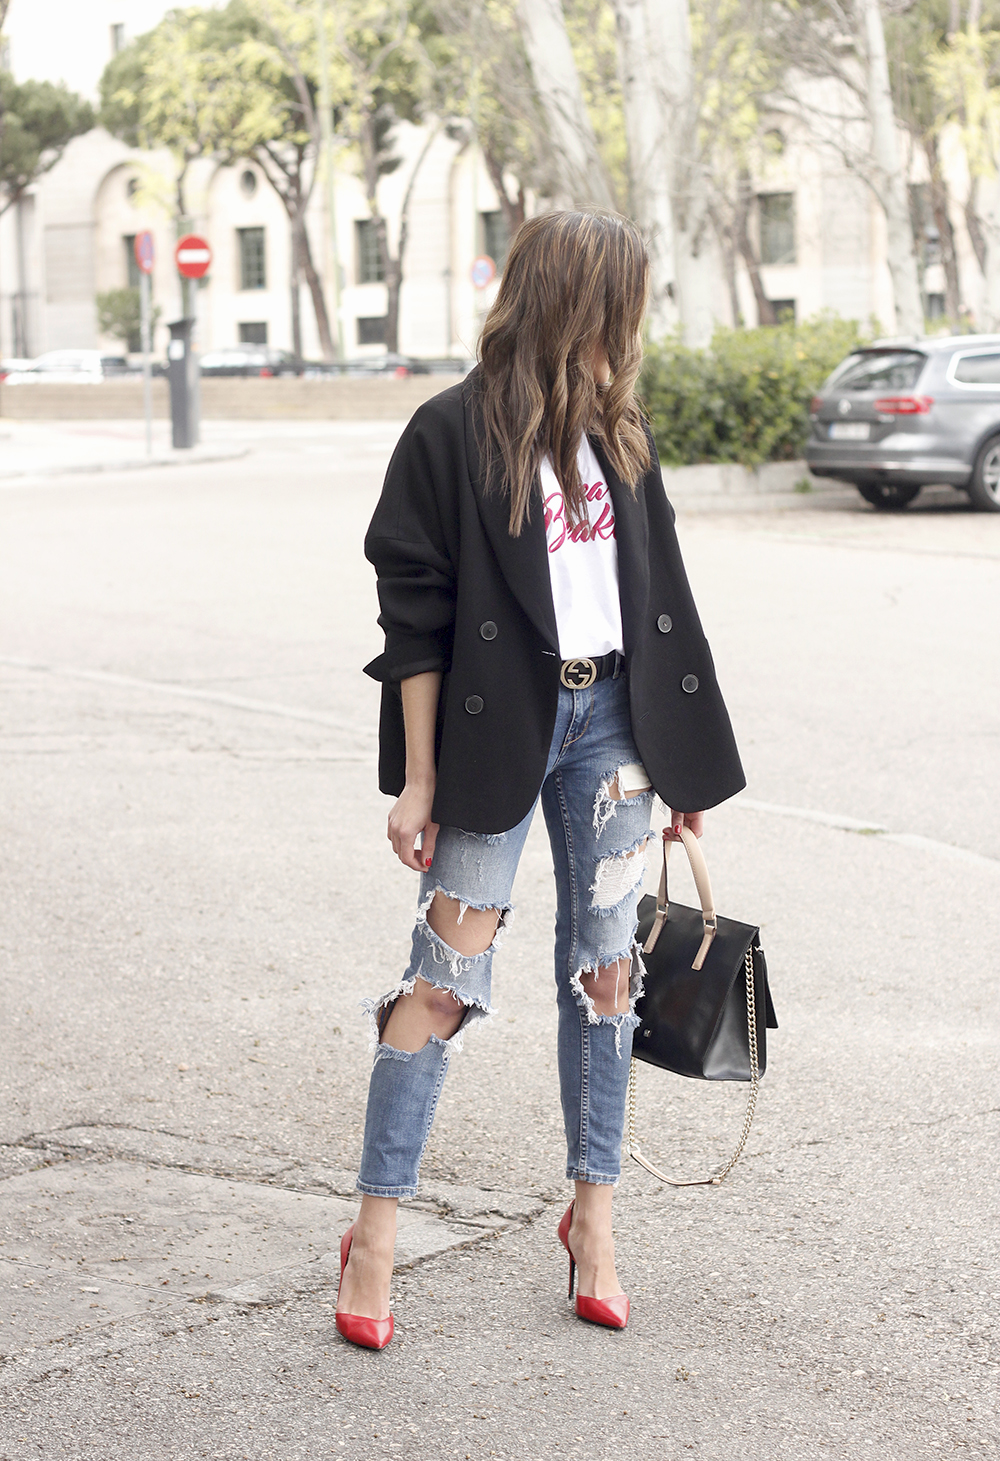 black blazer mango t-shirt heels purificación garcía bag accessories ripped jeans outfit style fashion03